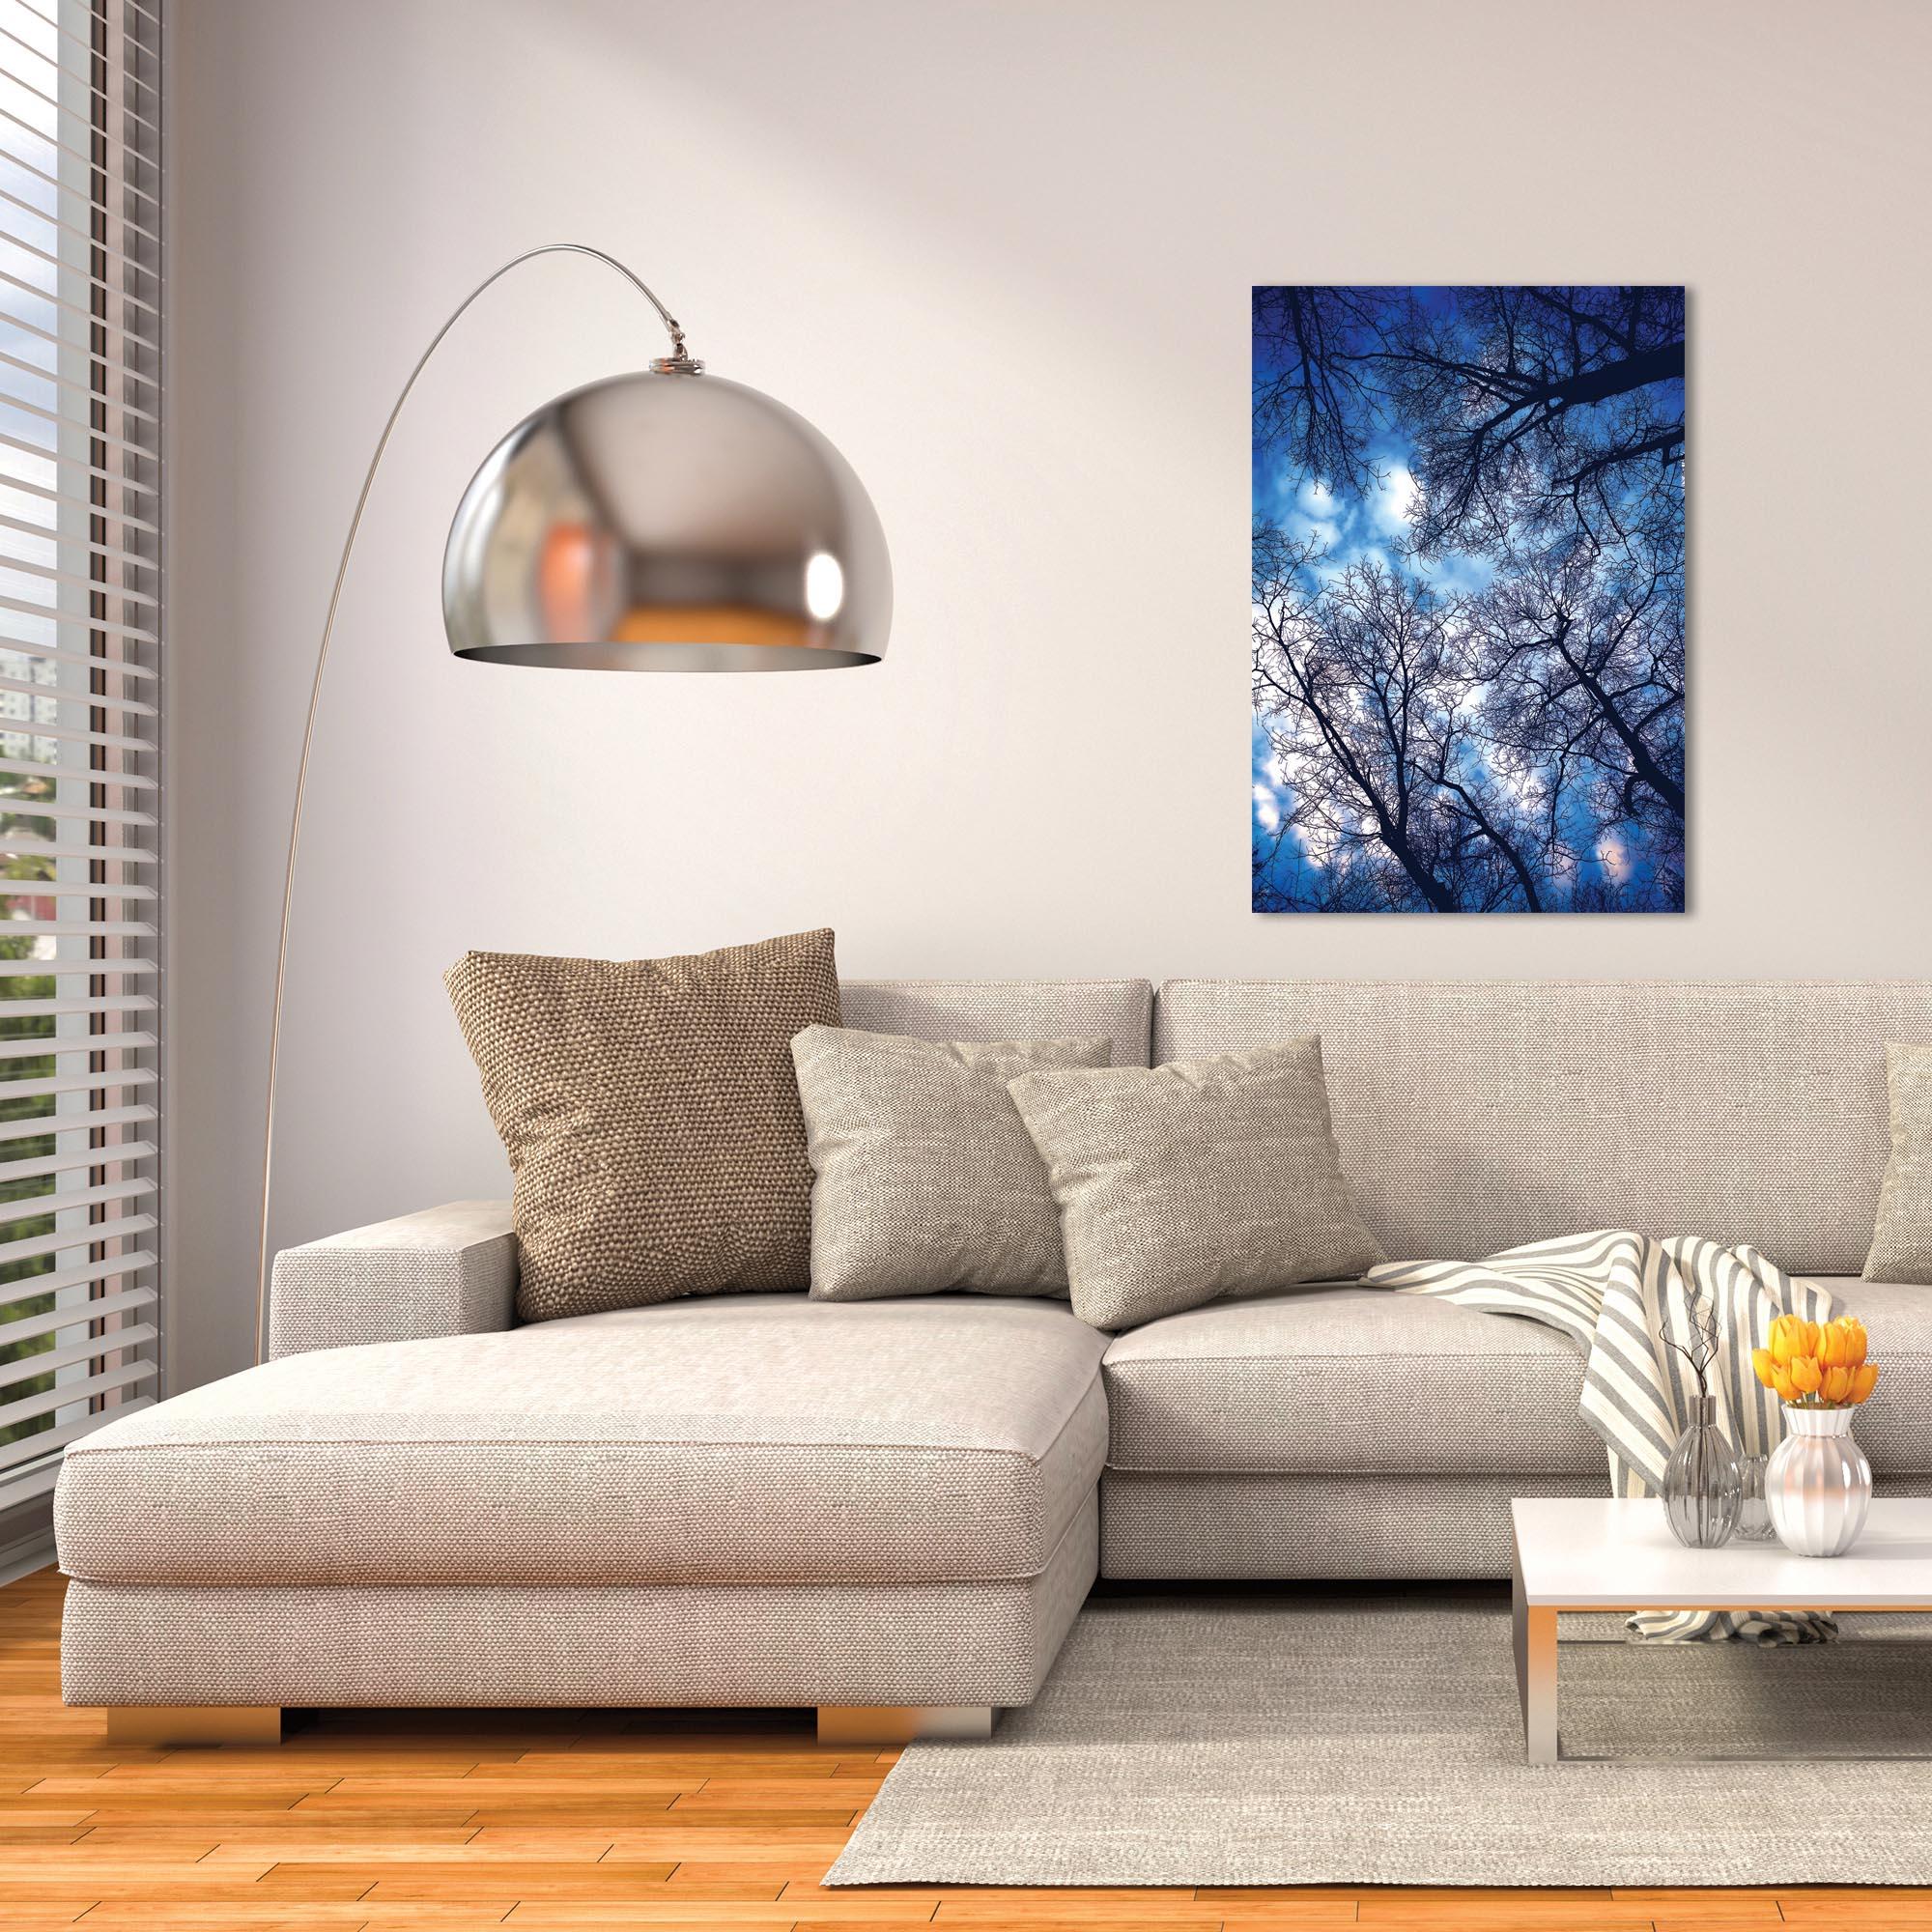 Landscape Photography 'Sky Vains' - Winter Scene Art on Metal or Plexiglass - Lifestyle View